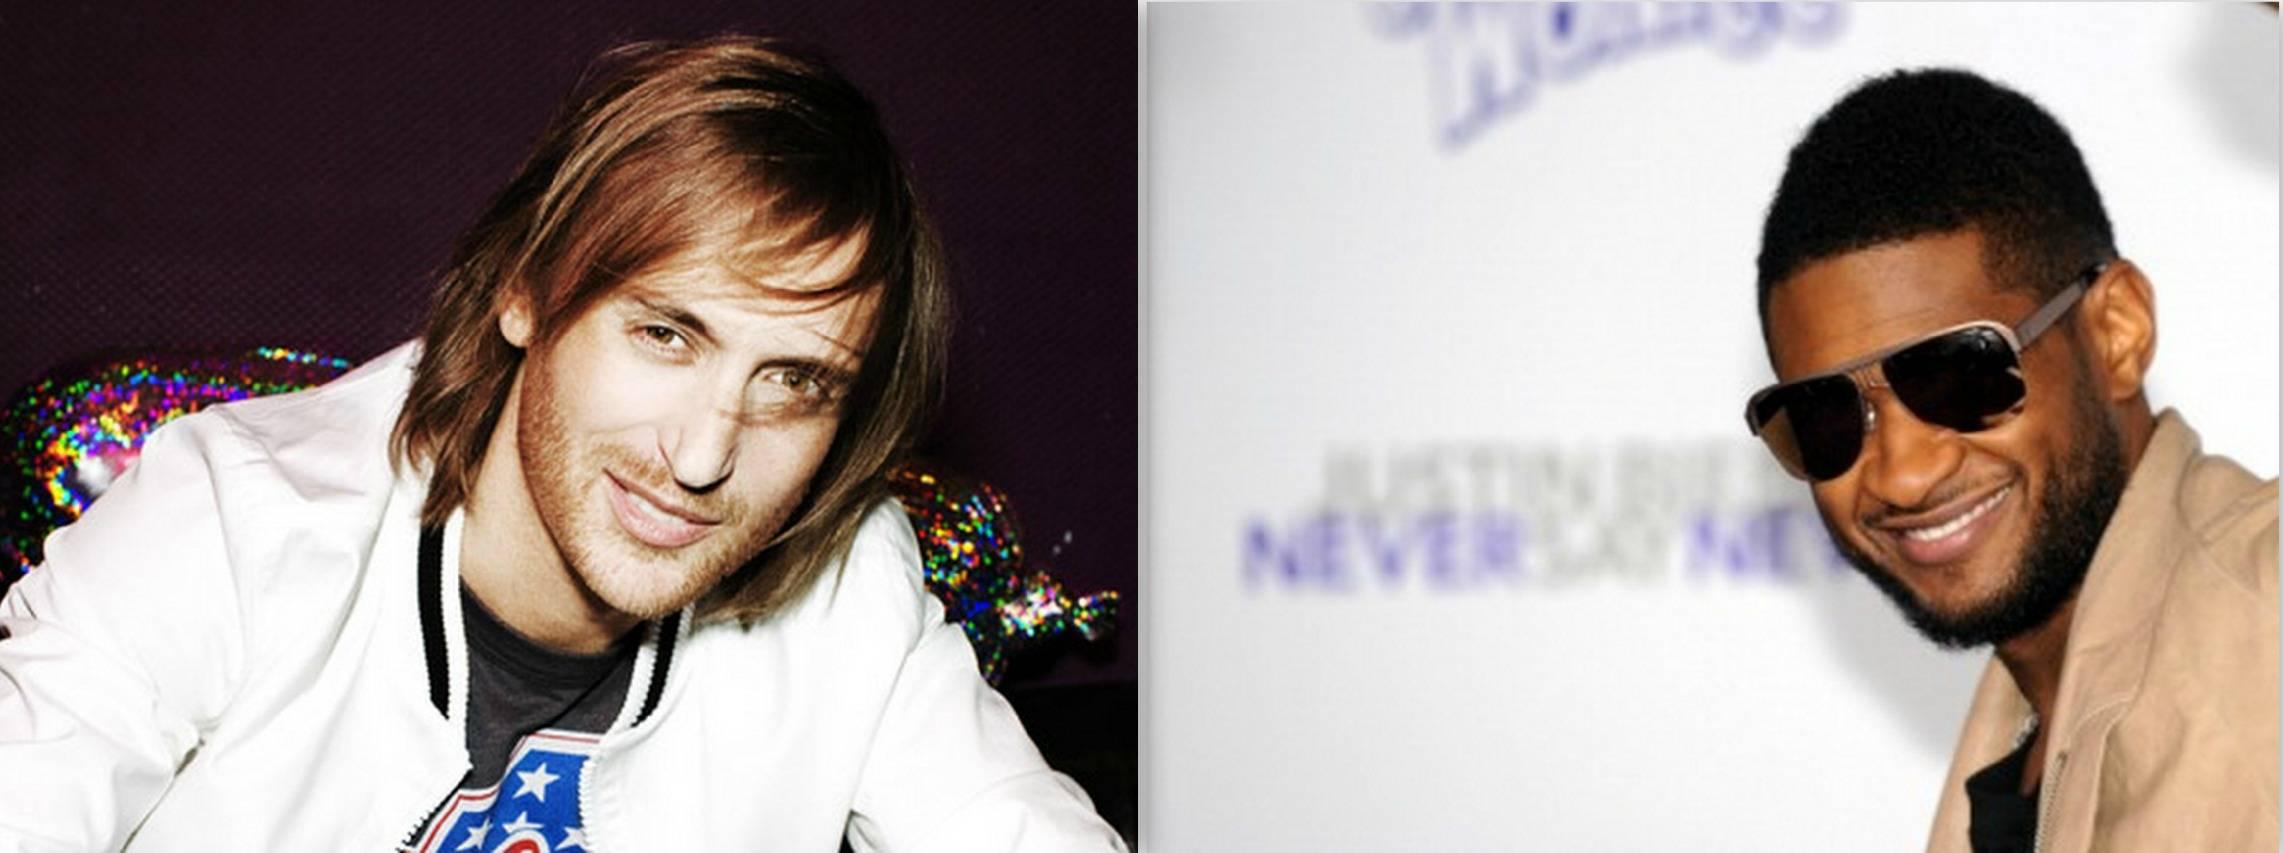 Guetta & Usher